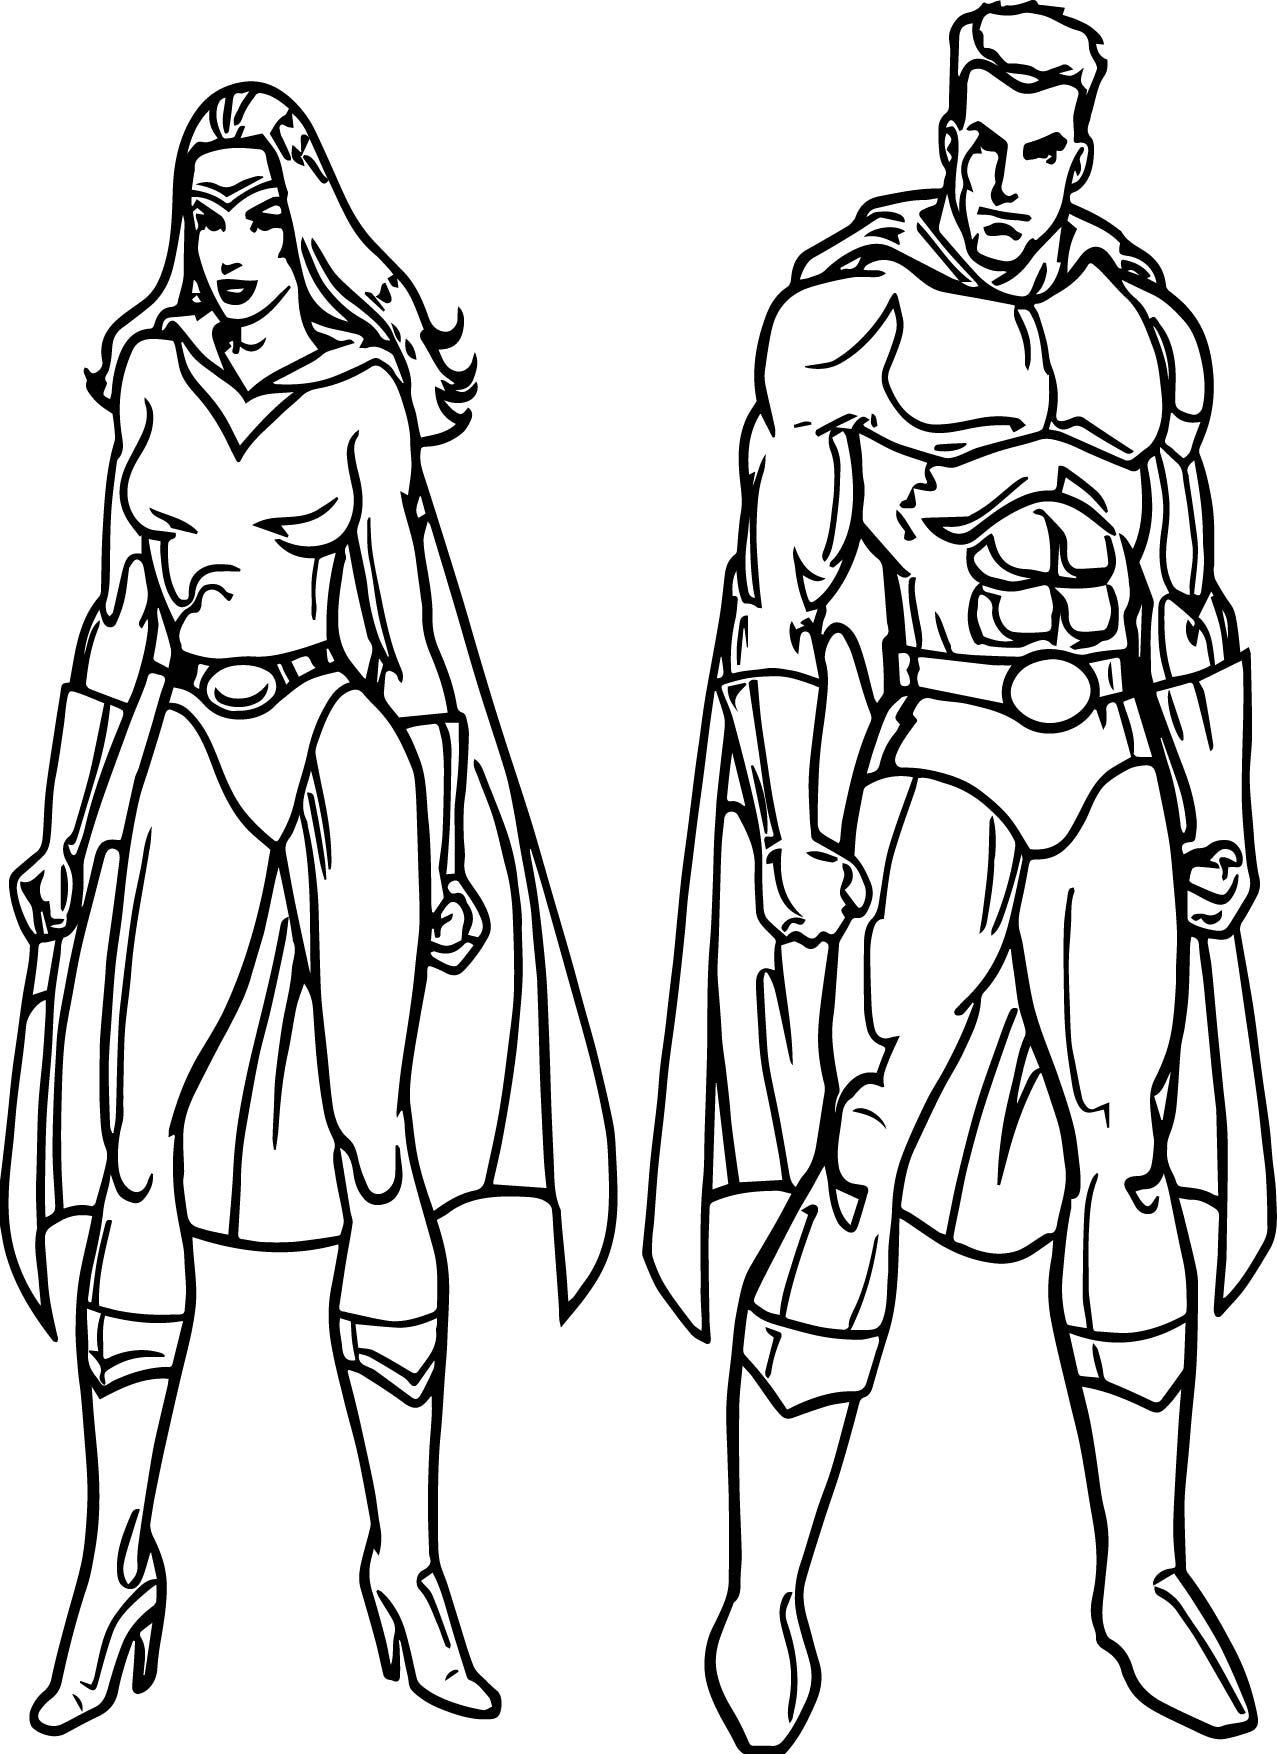 Superheroes Super Hero Man Woman Coloring Page